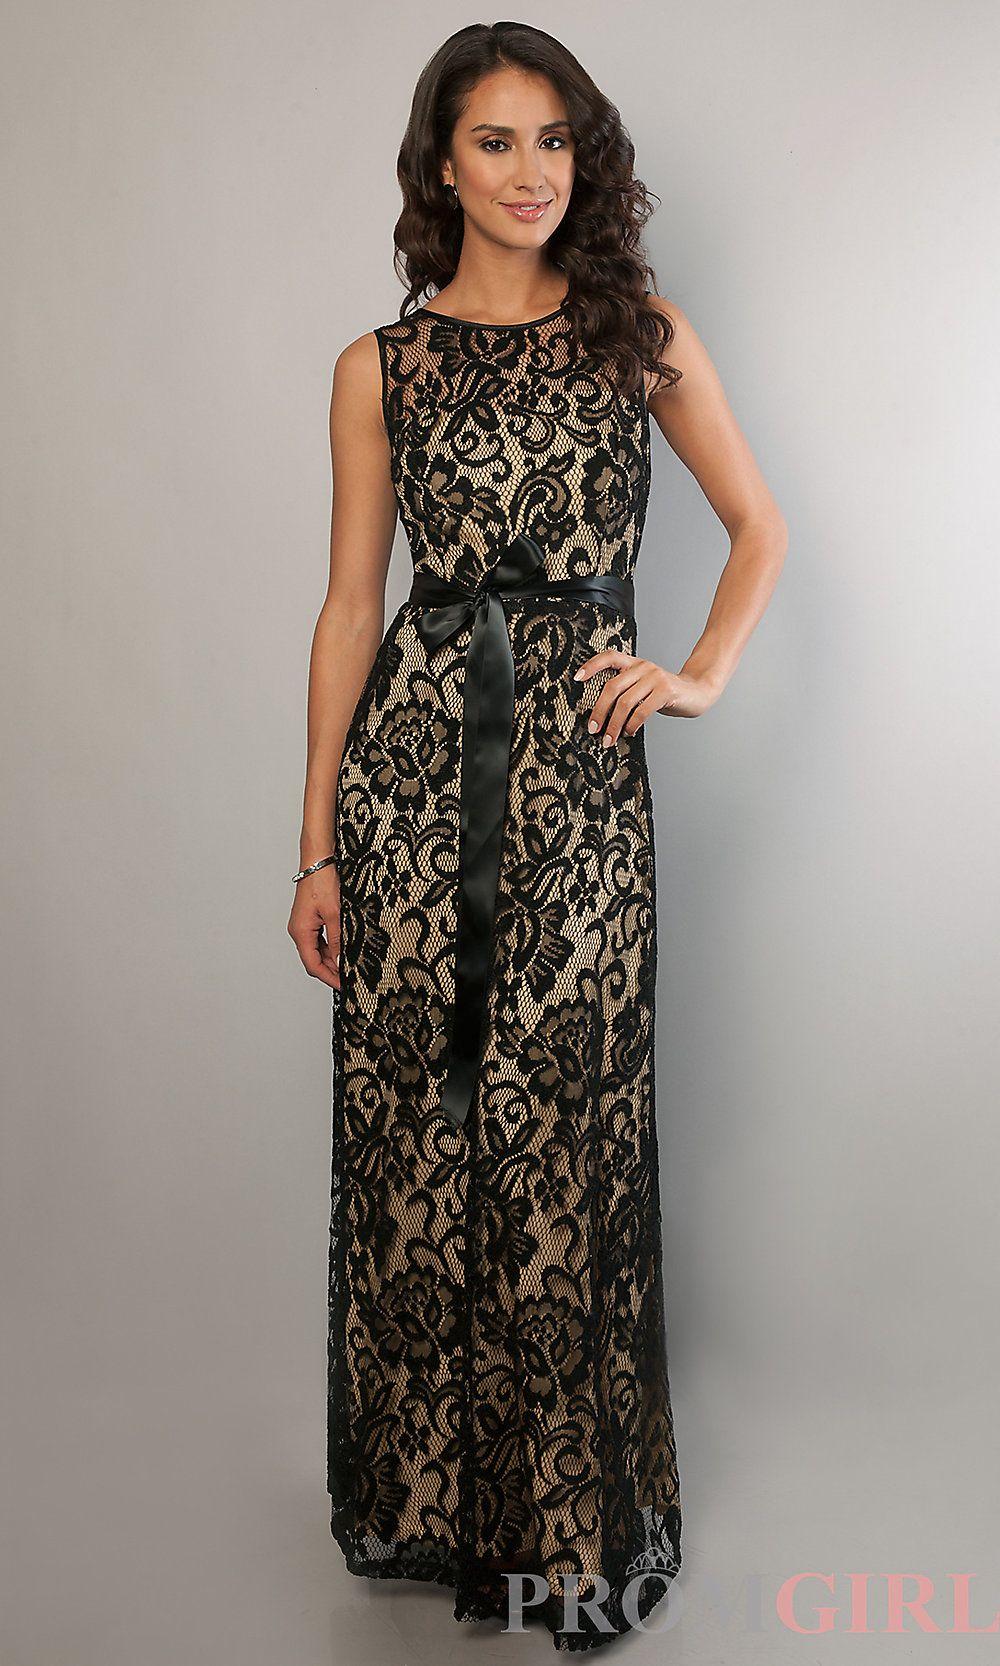 Sally fashions long sleeveless lace dress promgirl wedding